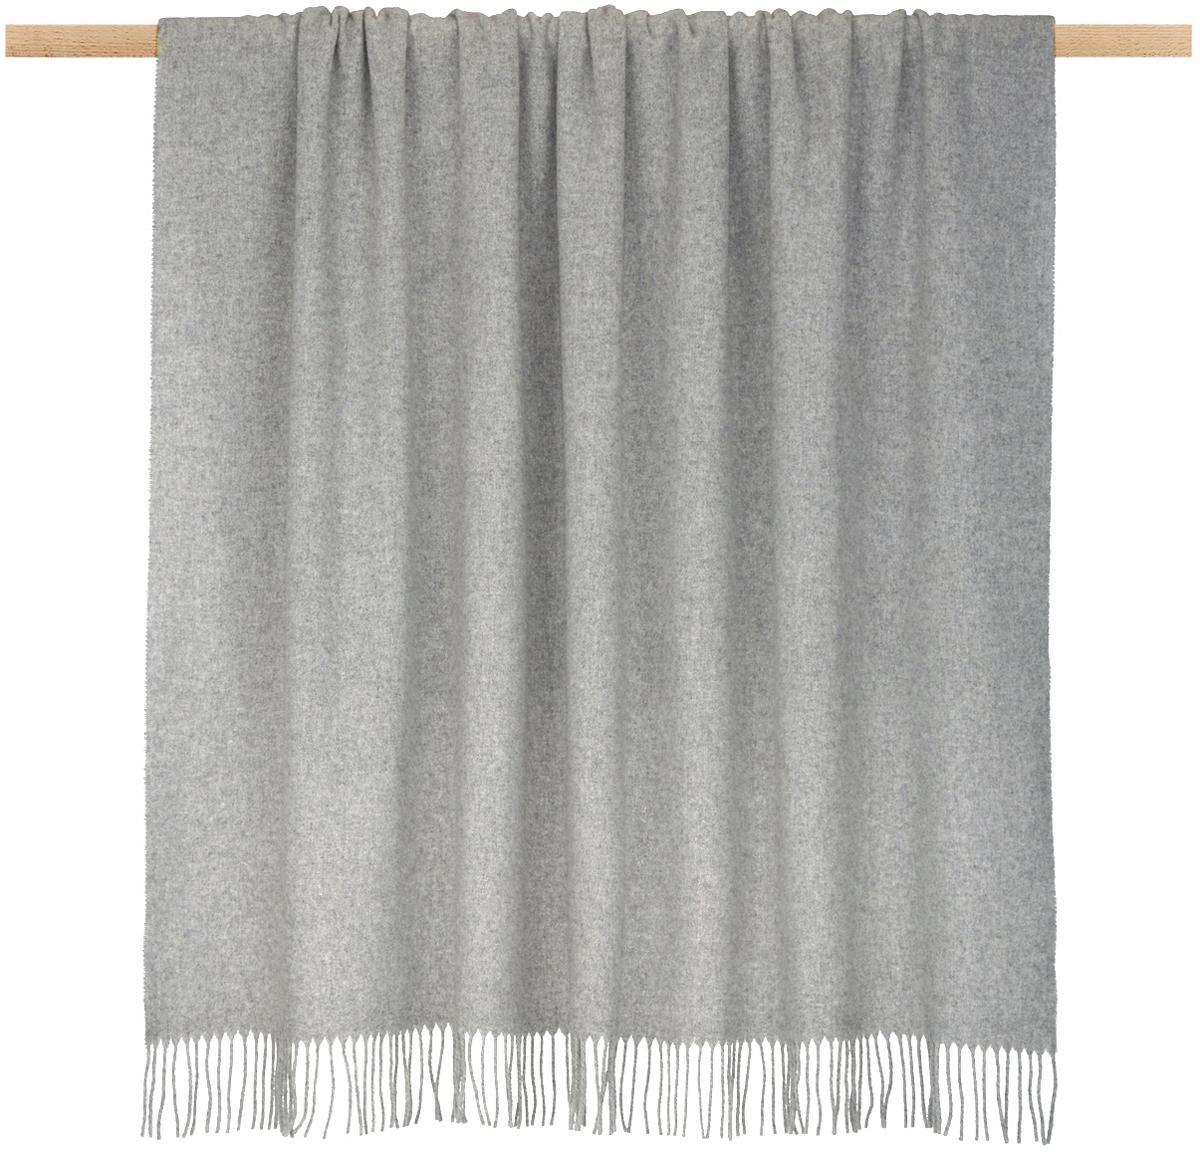 Manta de lana ligera con flecos Patriciu, 100%lana, Gris claro, Cama 90 cm (150 x 220 cm)